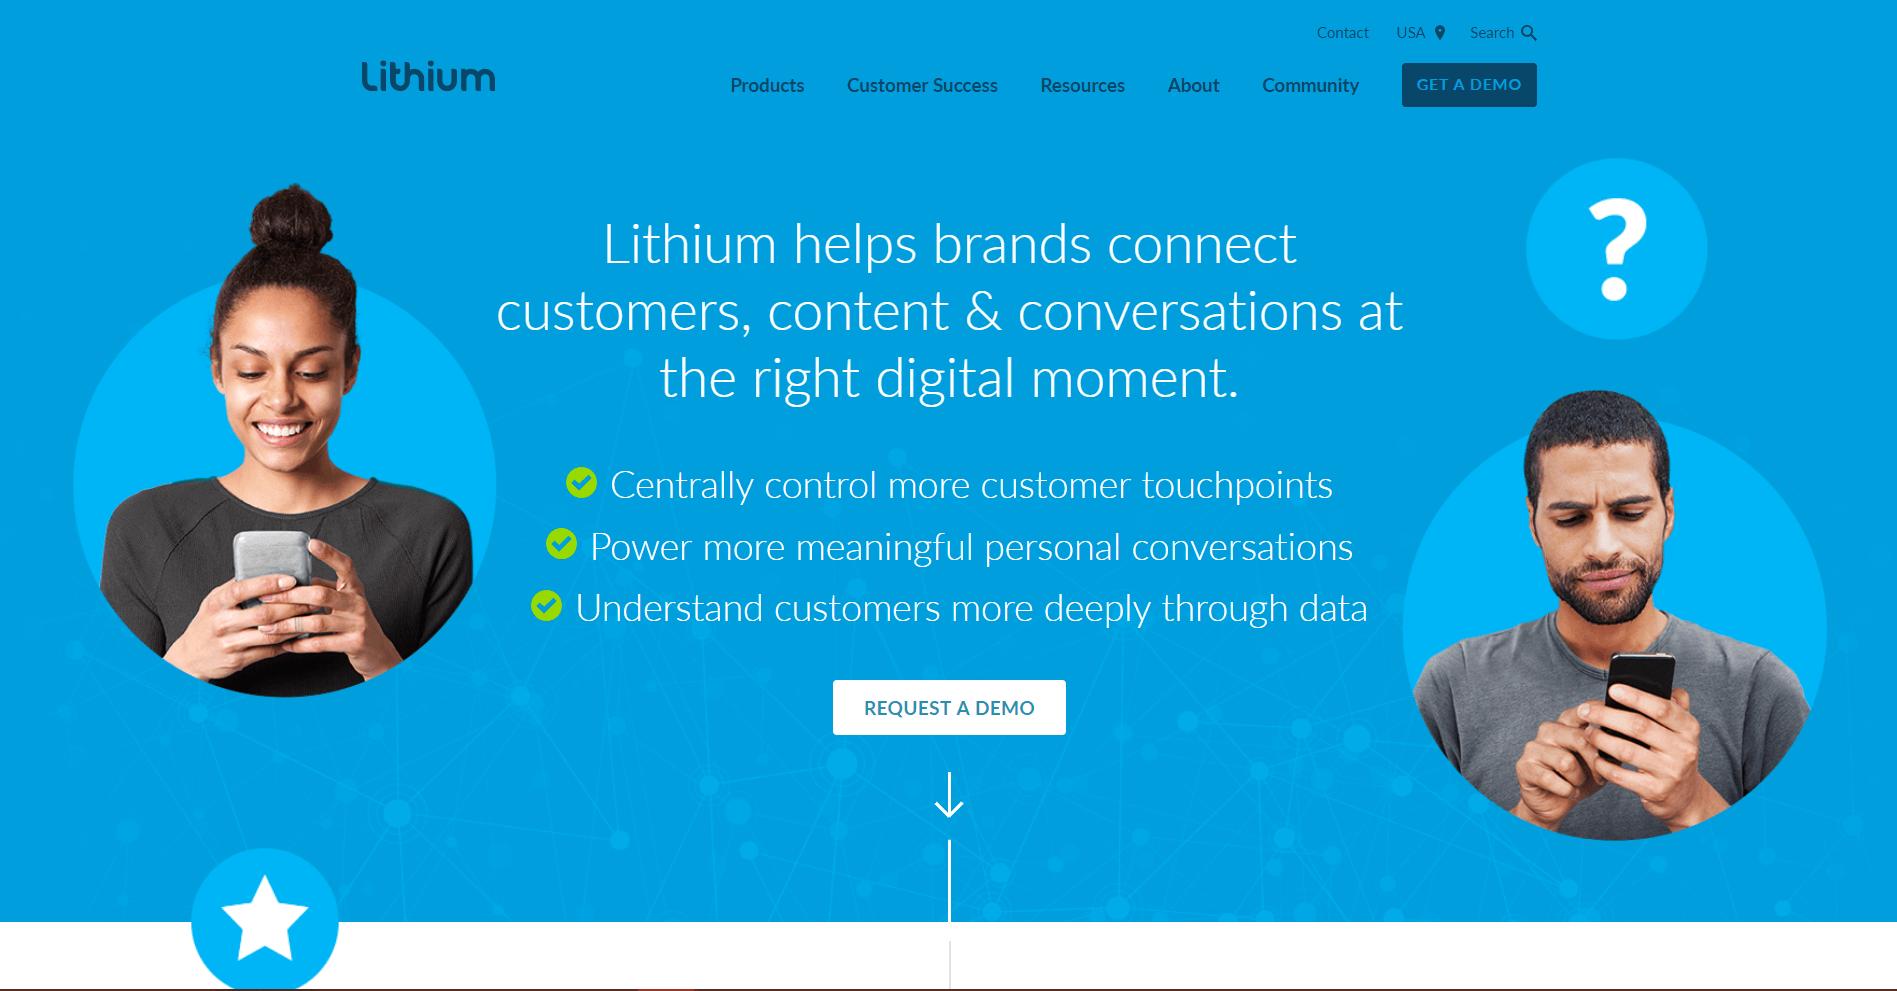 Lithium Social Media Marketing Tool